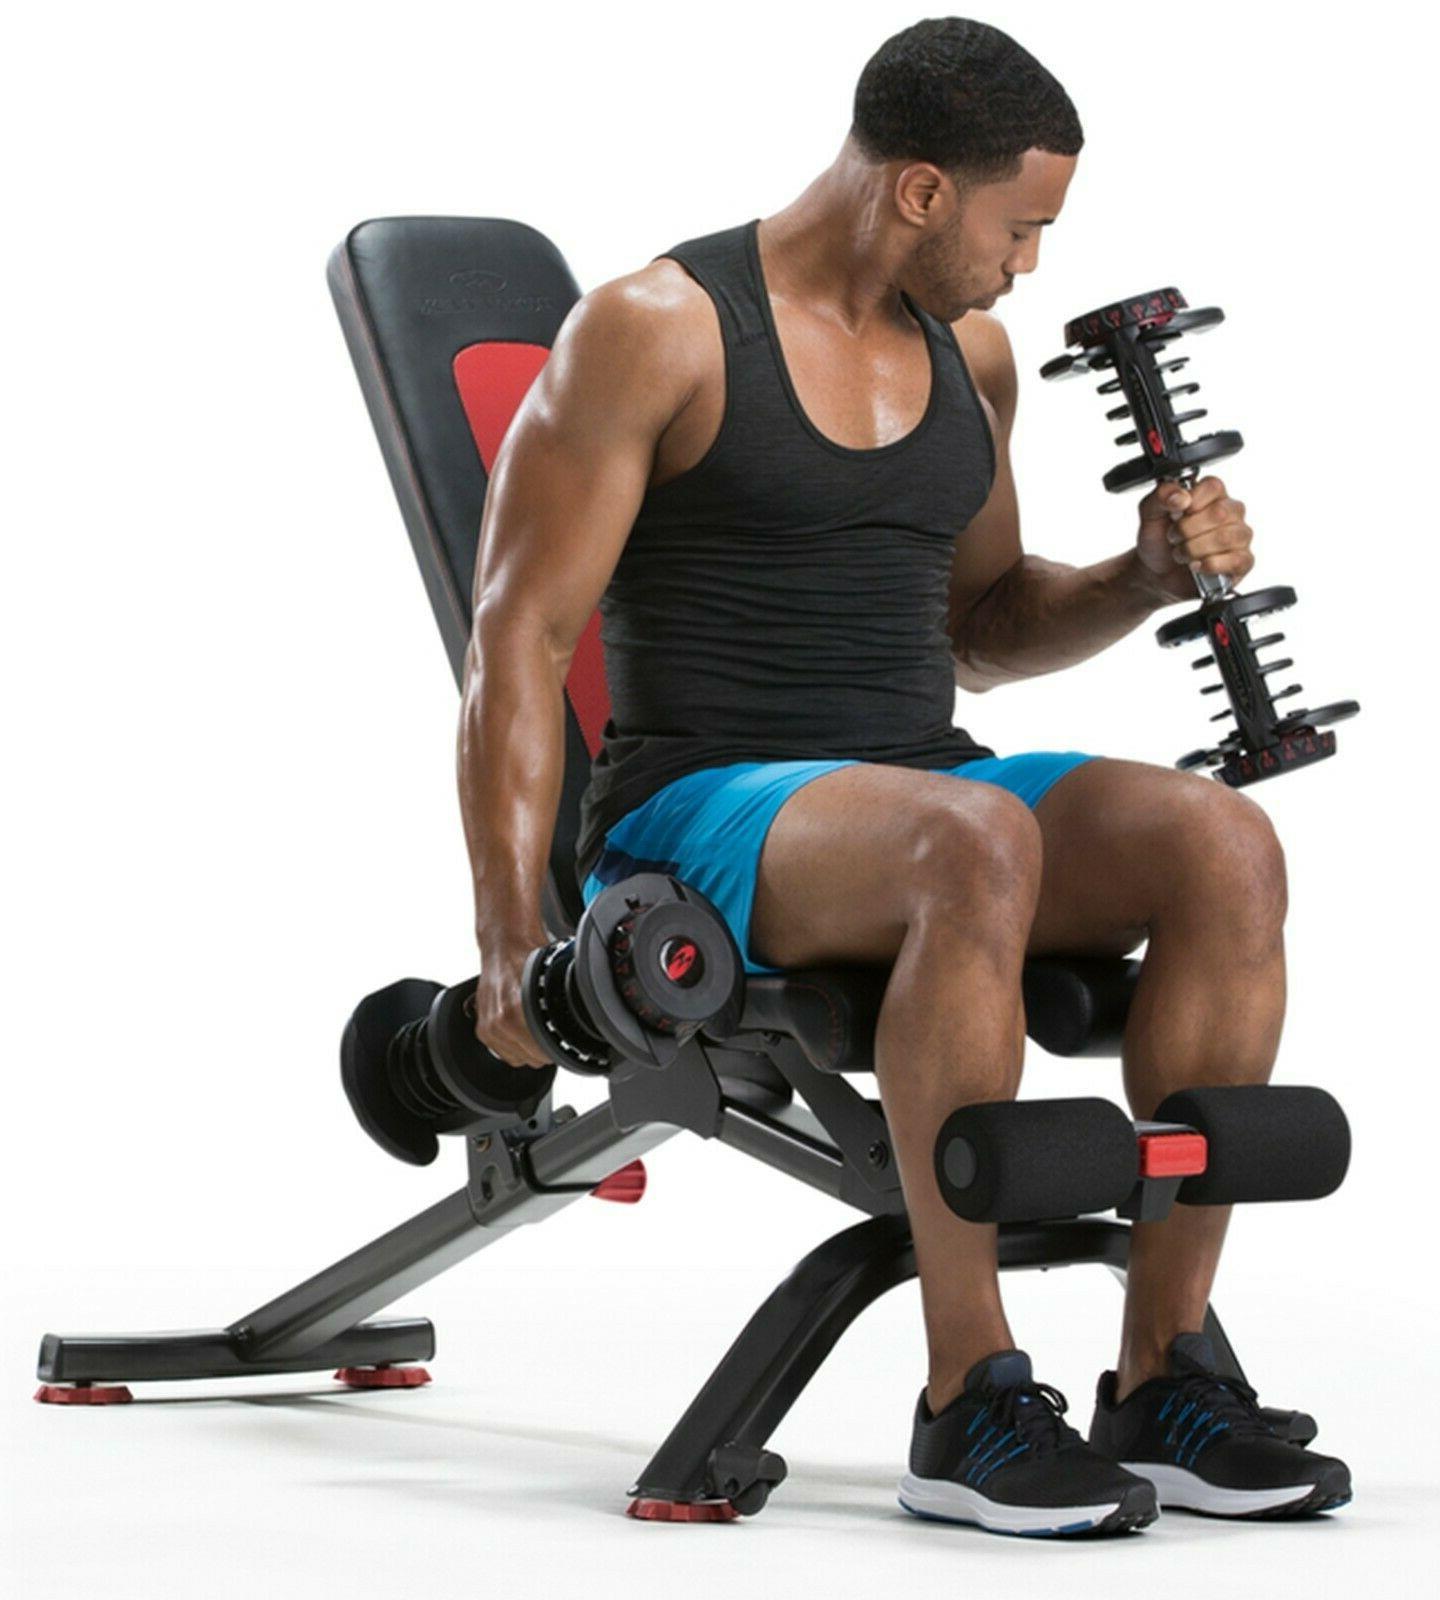 Bowflex Home Gym - Dummbbell Set + 5.1S Bench